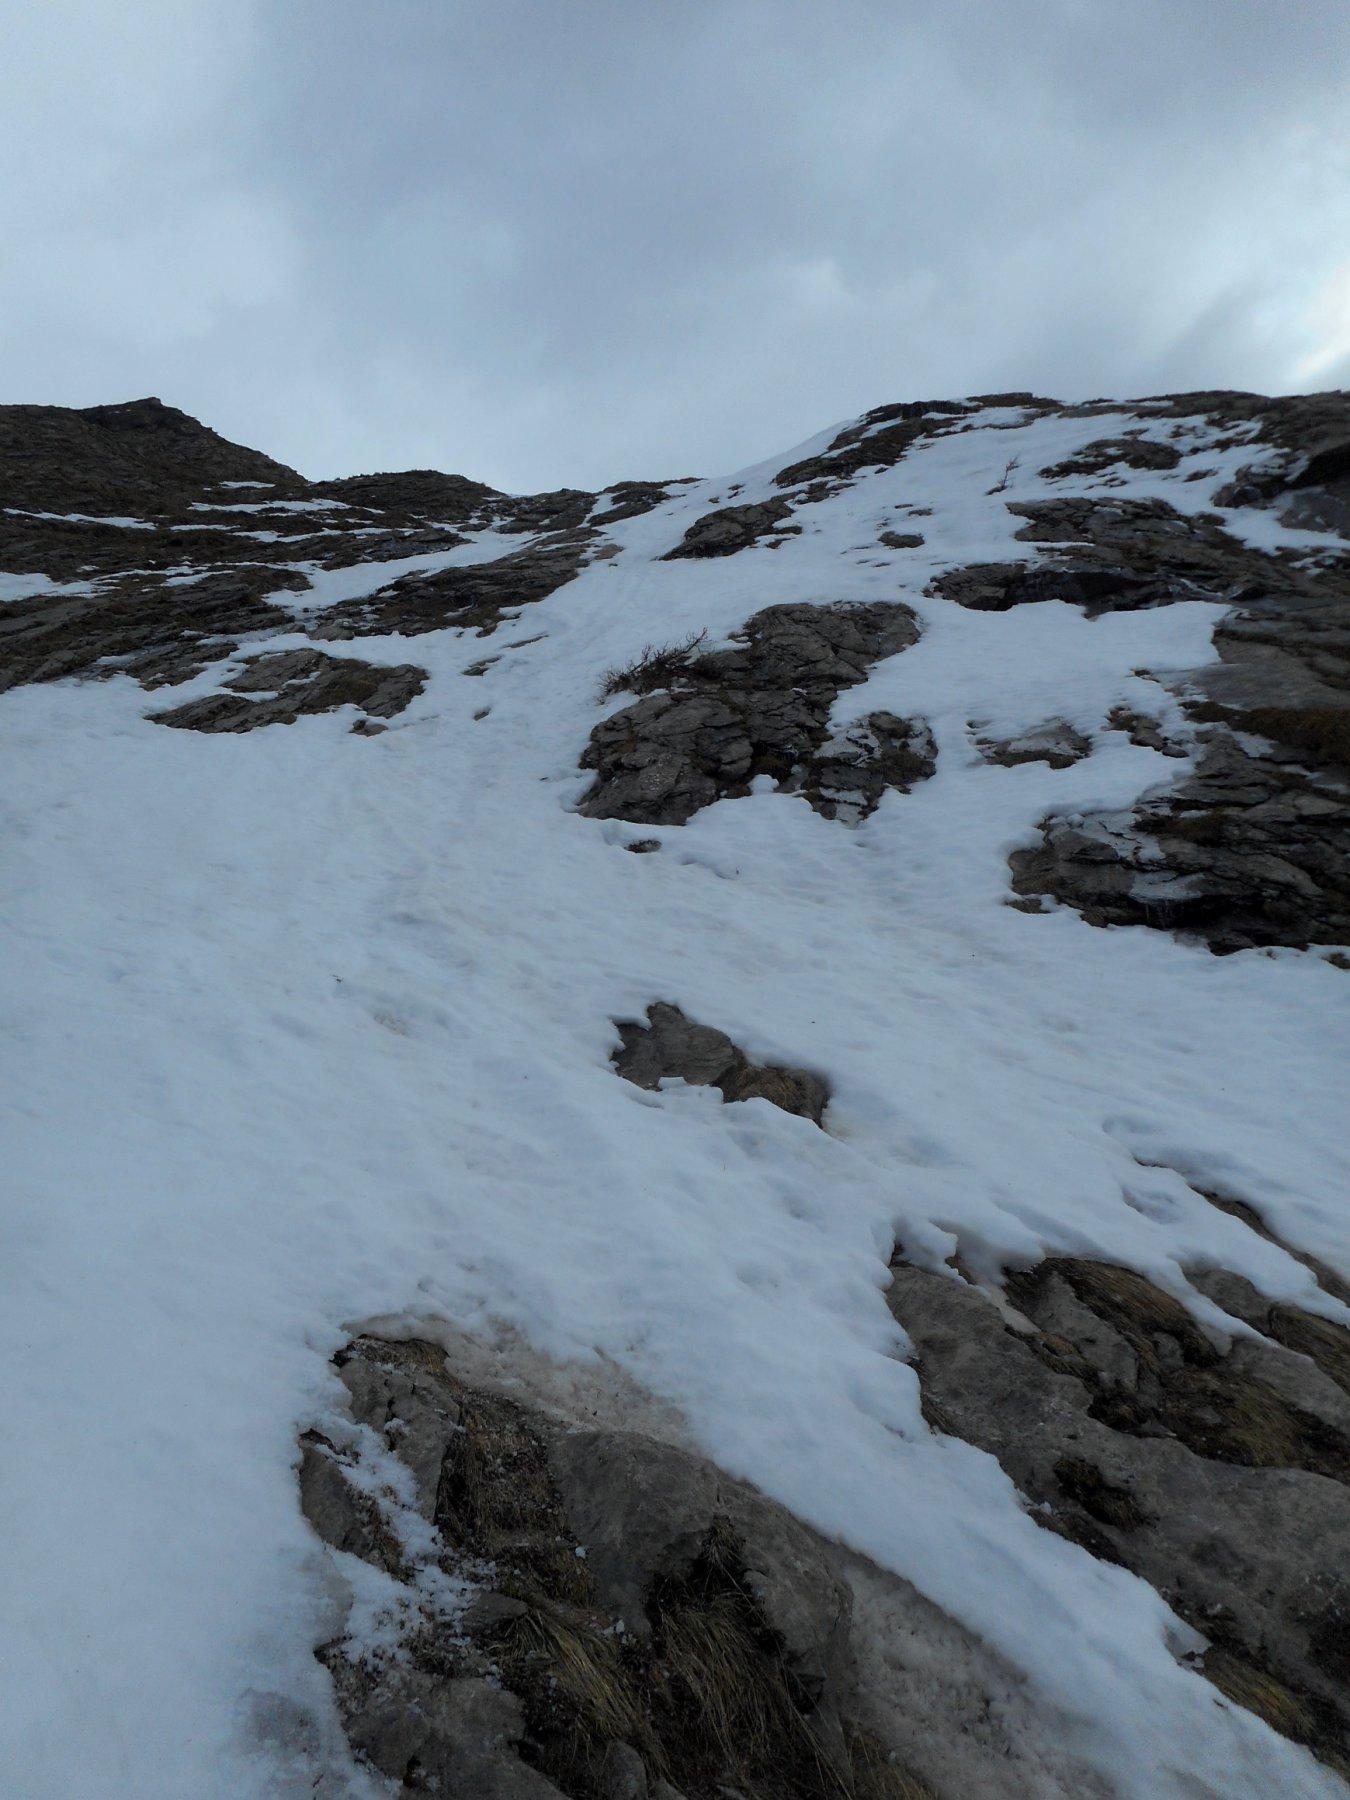 poca neve nella parte bassa ripida